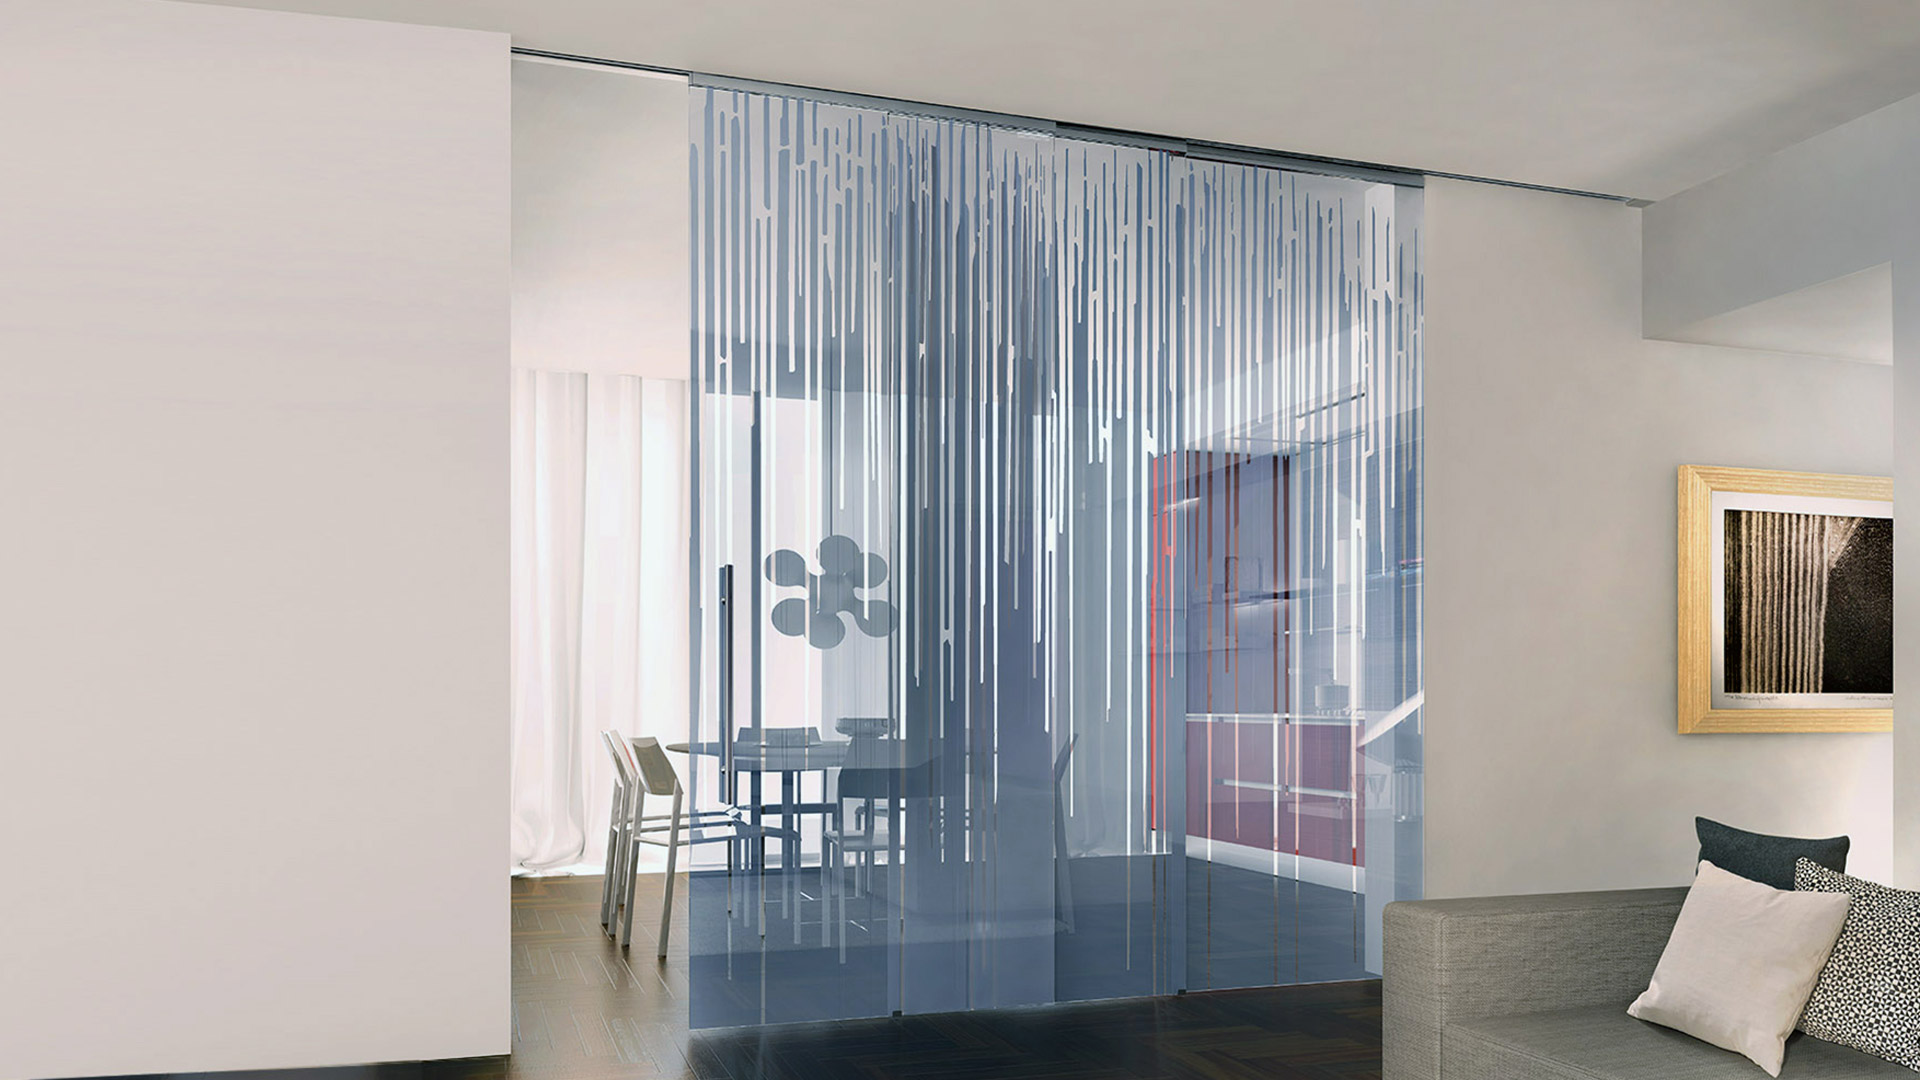 Pareti Di Vetro Scorrevoli : Pareti scorrevoli in vetro beautiful porte in vetro scorrevoli